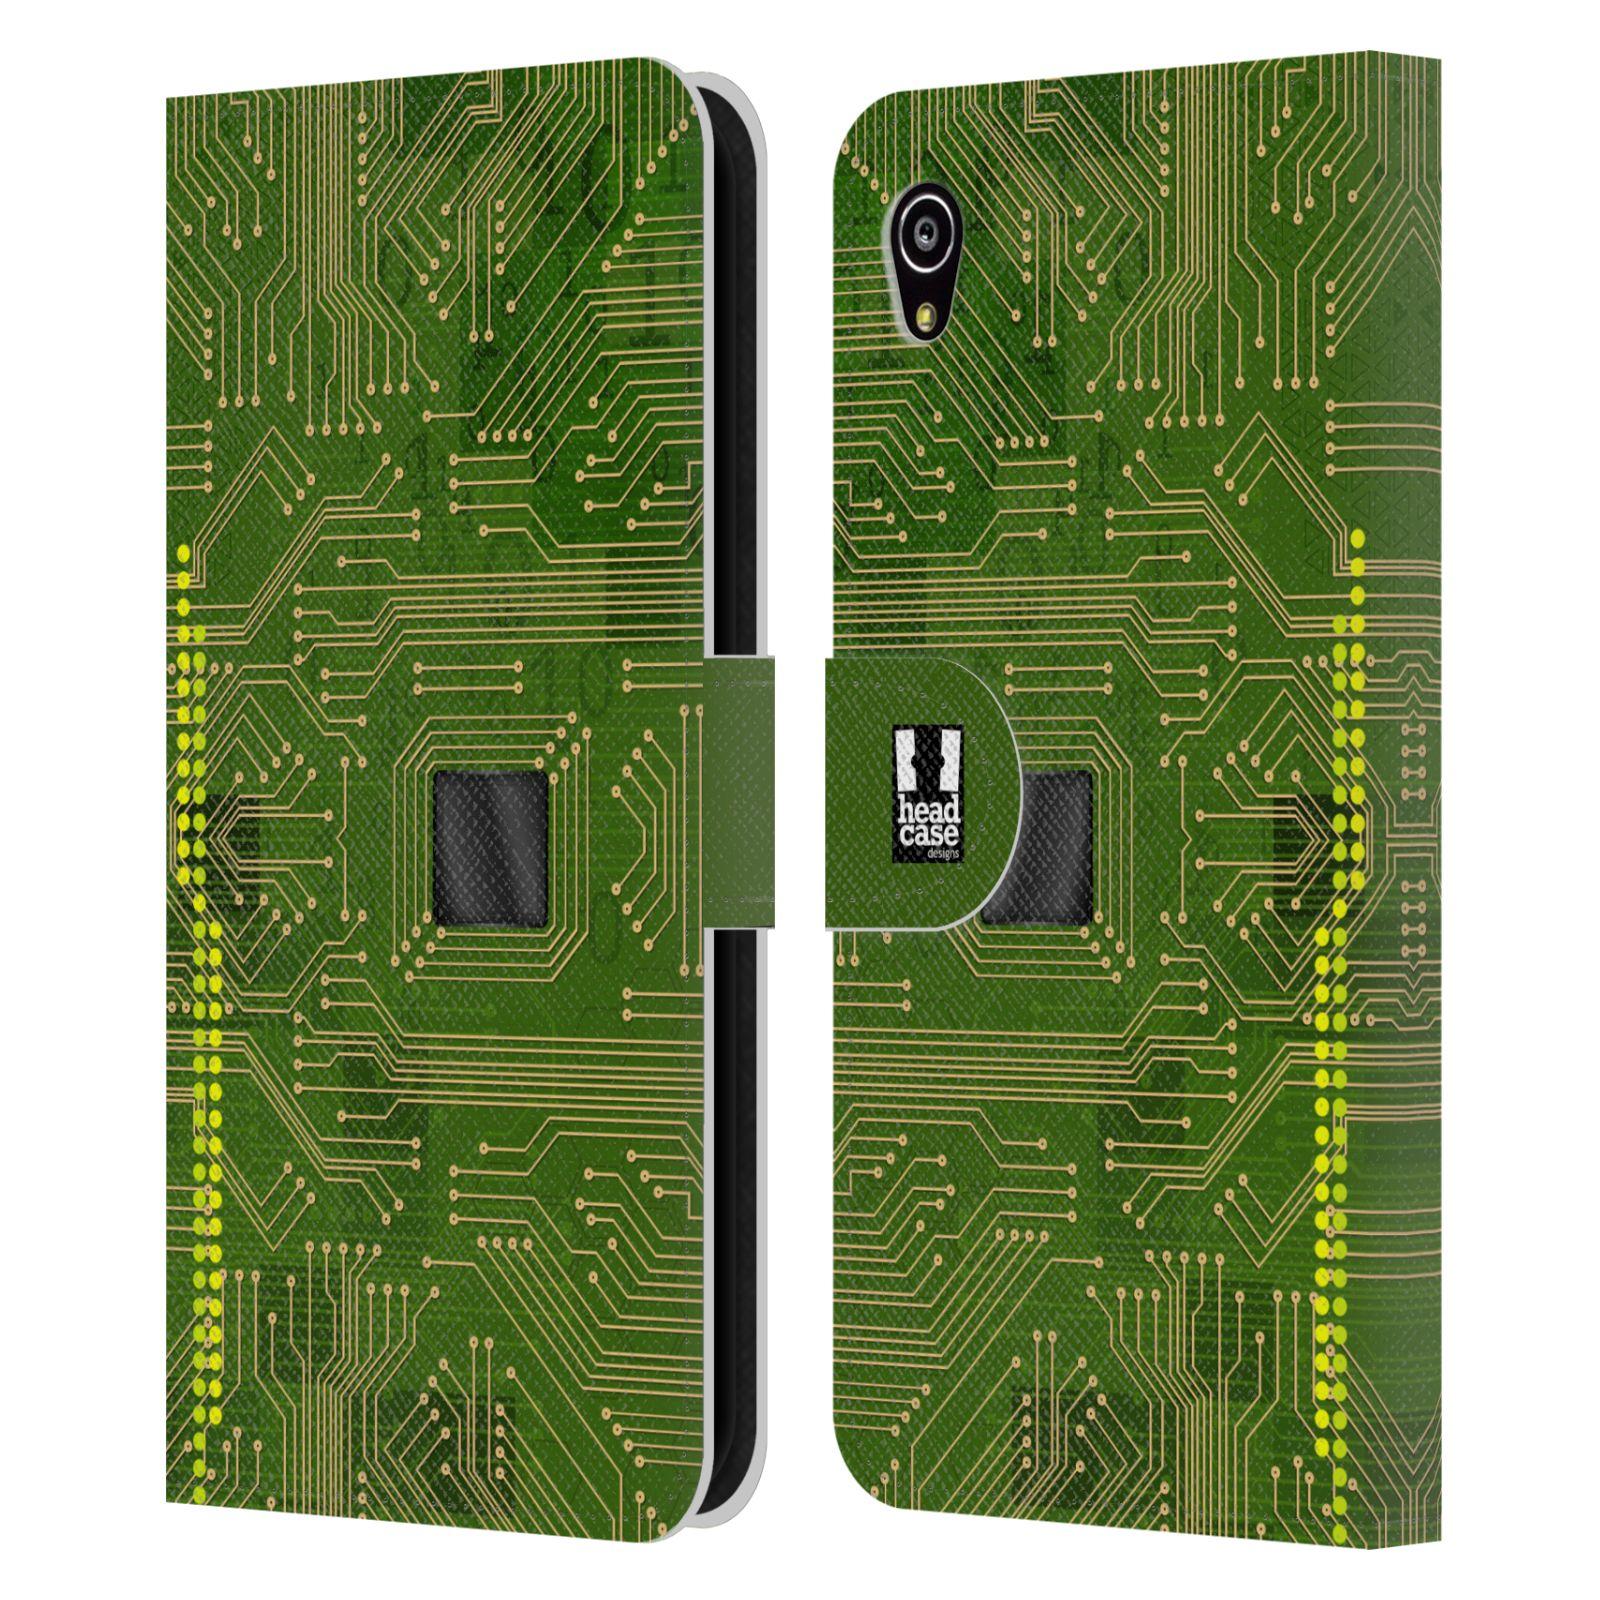 HEAD CASE Flipové pouzdro pro mobil SONY XPERIA M4 AQUA počítač základní deska zelená barva